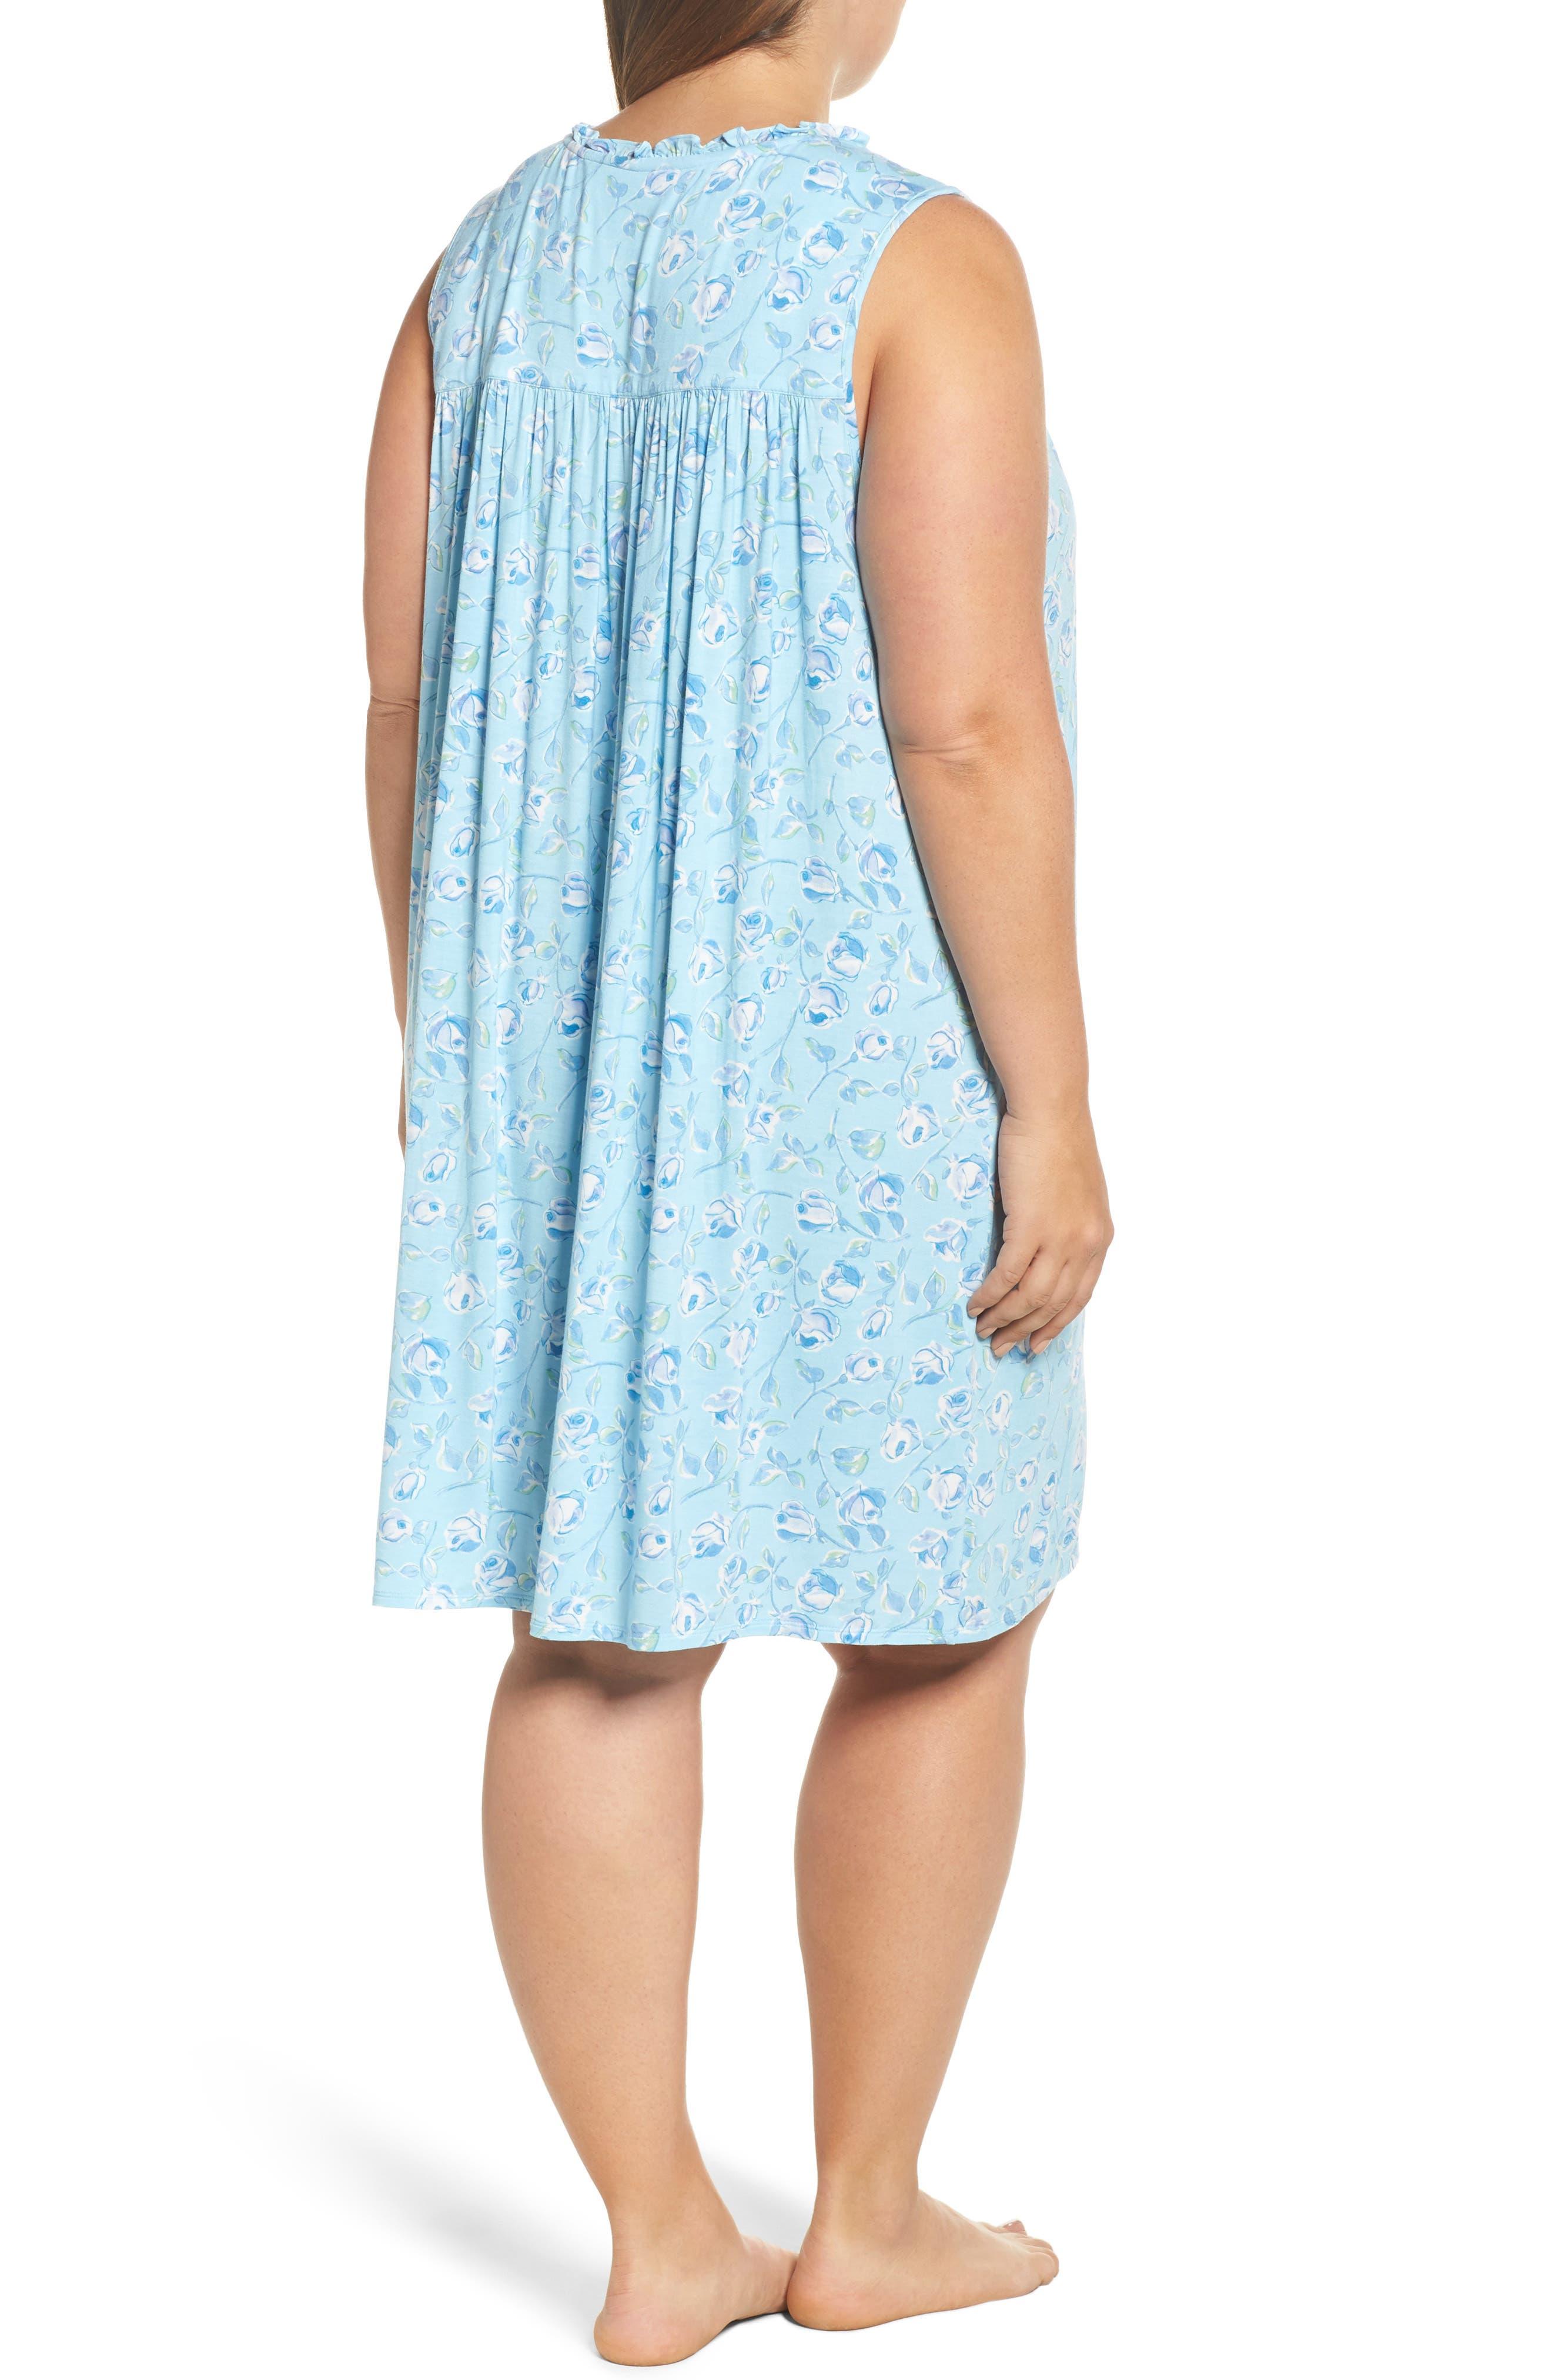 Short Nightgown,                             Alternate thumbnail 2, color,                             Light Seaglass/ Multi Roses